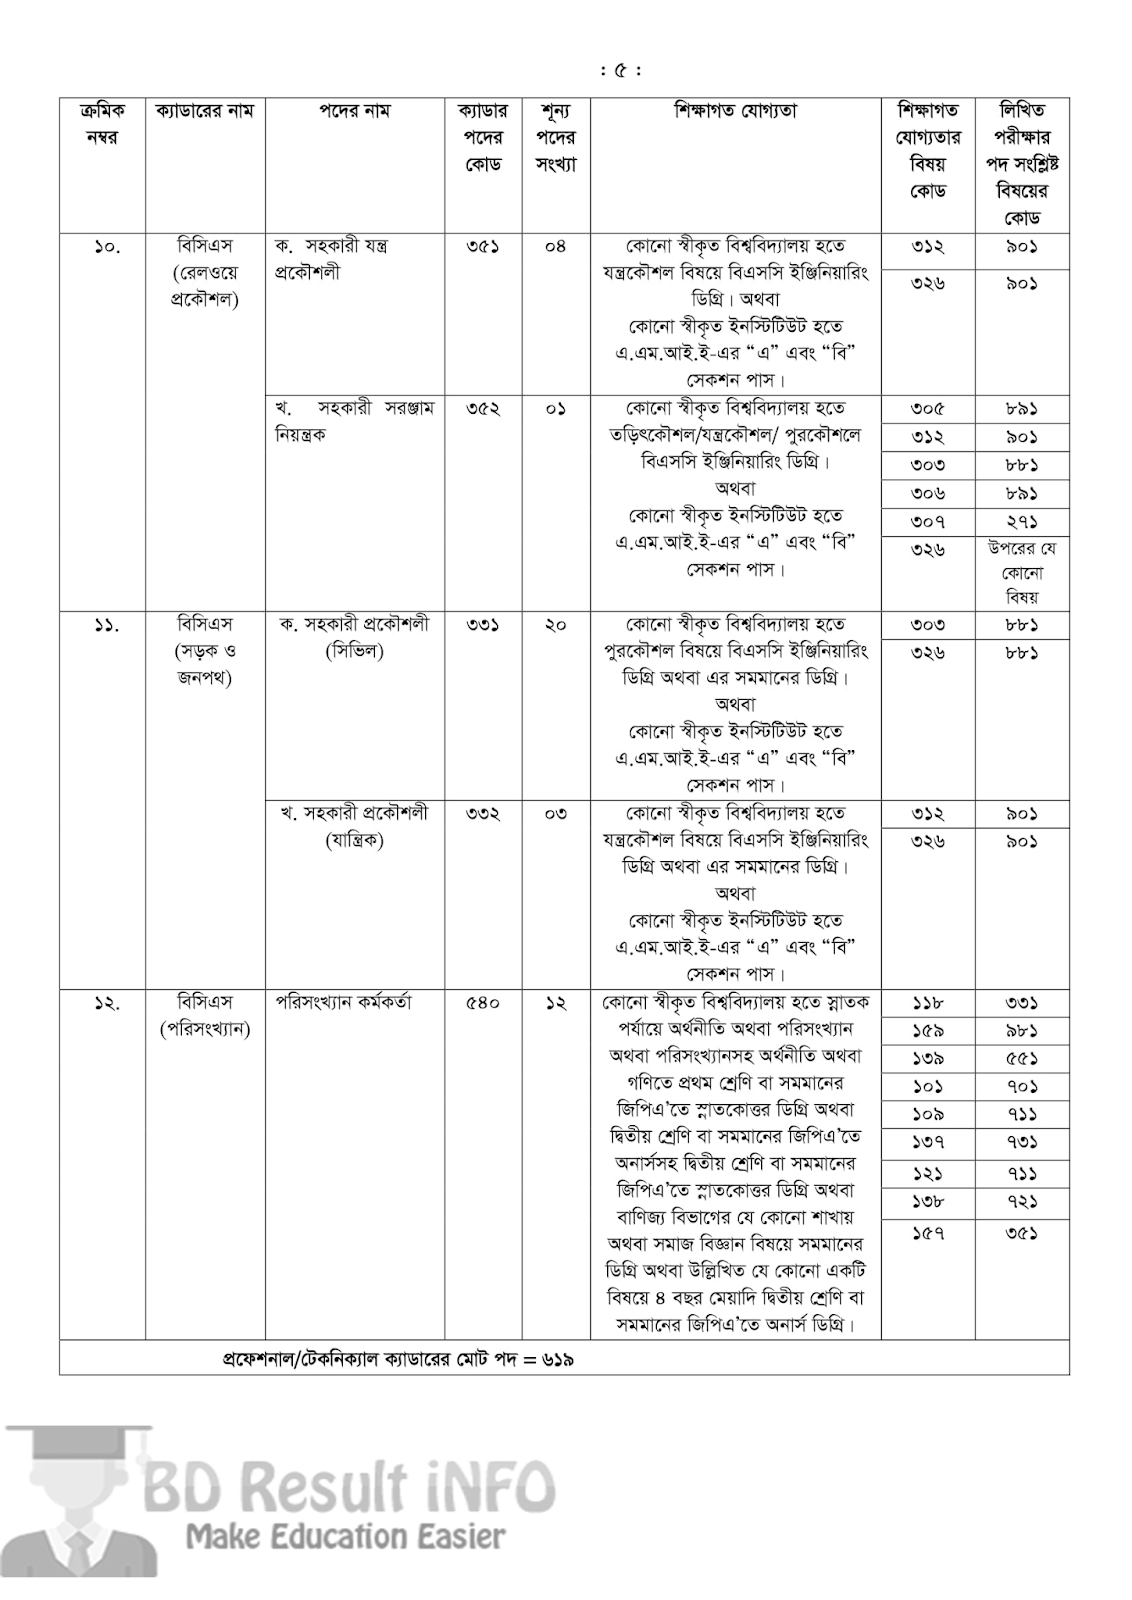 41st BCS Circular 2019 PDF Download